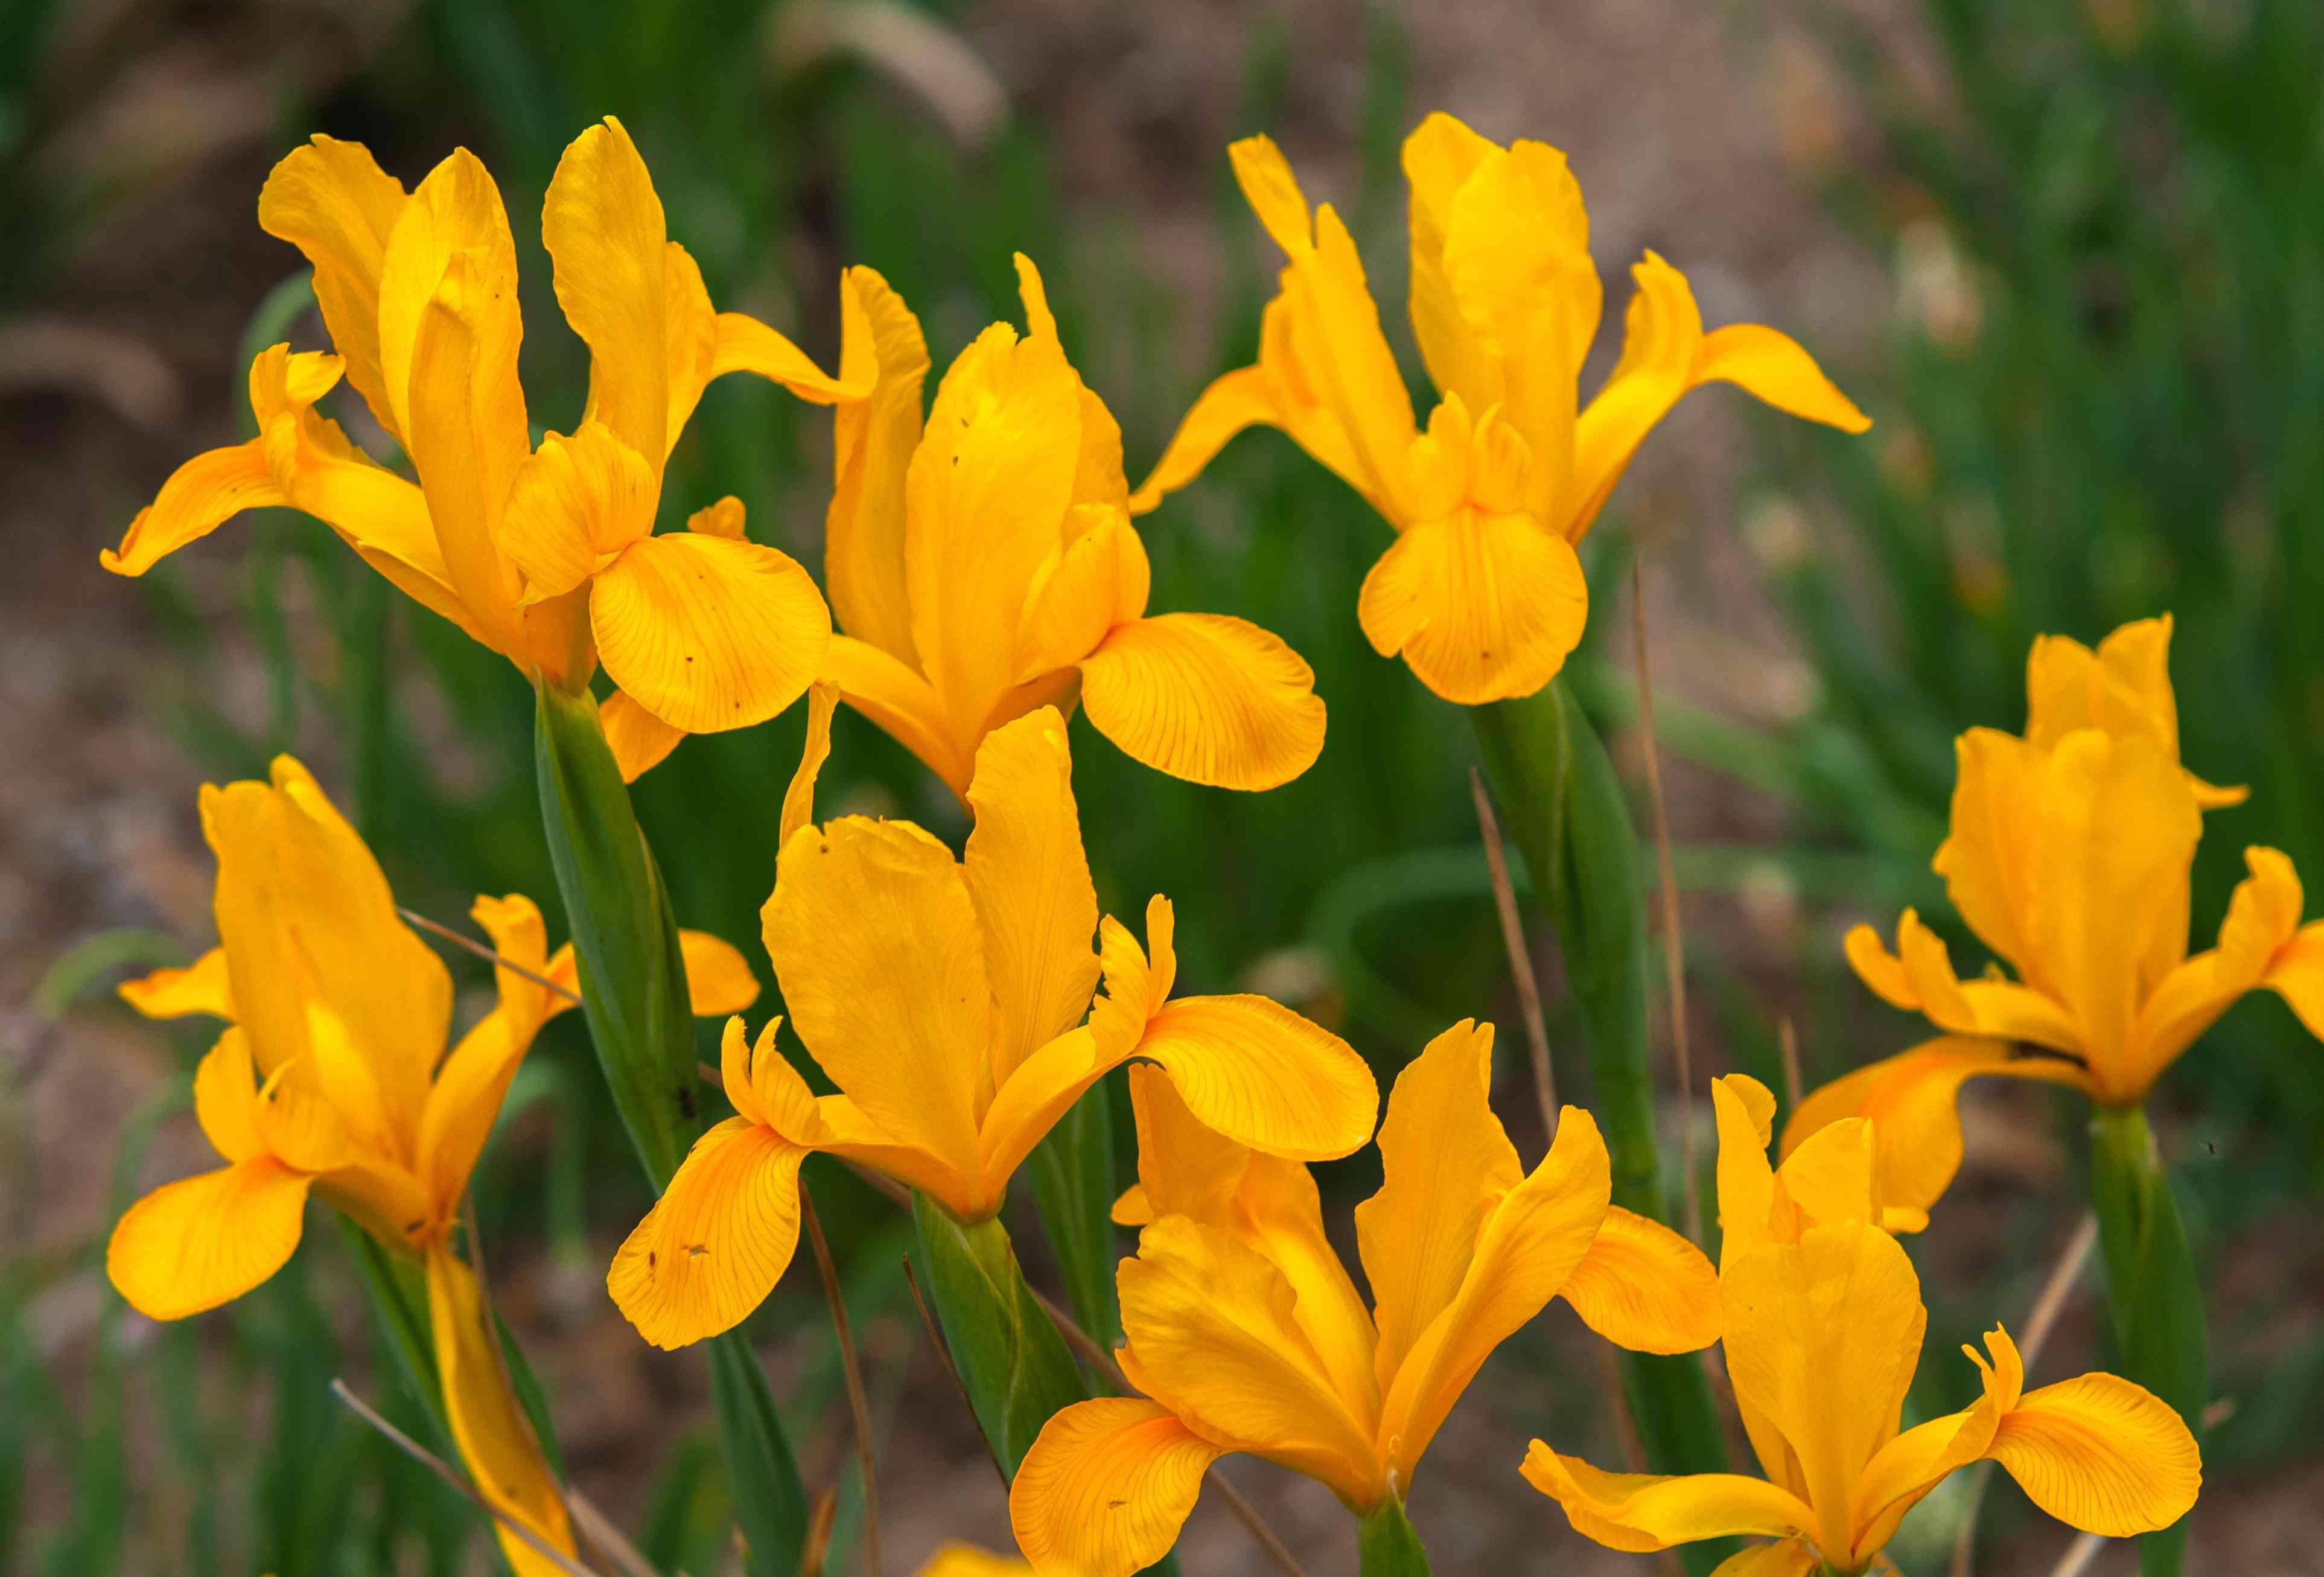 Dutch iris royal yellow plant with yellow flowers